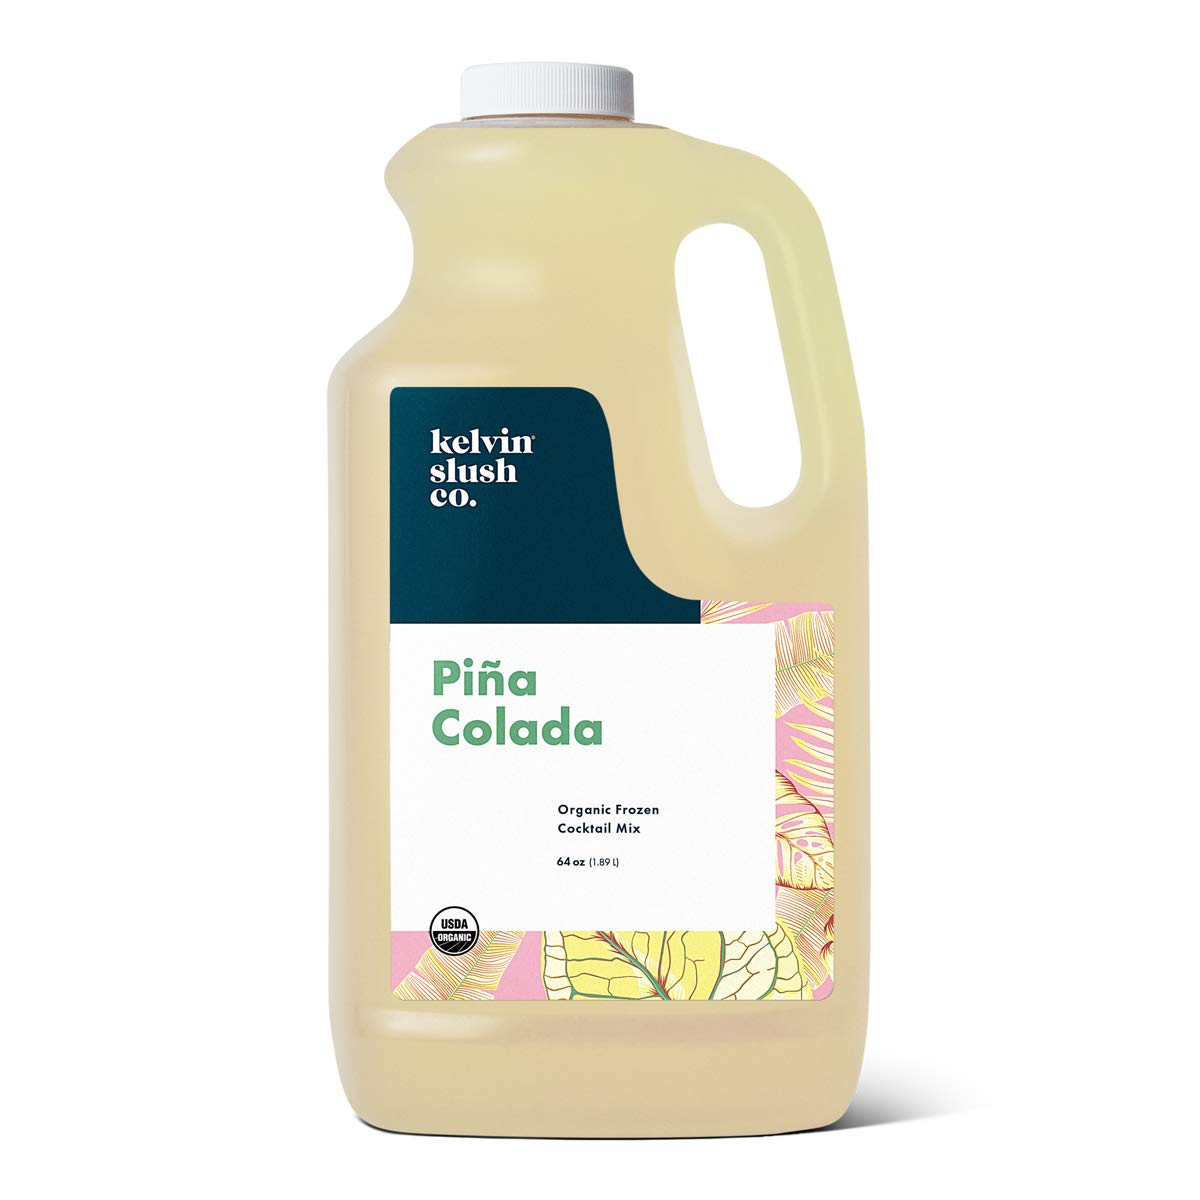 Kelvin Slush Co. – Piña Colada – Organic Frozen Cocktail & Slush Mix – Award-Winning Slush Machine & Blender Mix, Bars, Restaurants, At Home (64 oz bottle)